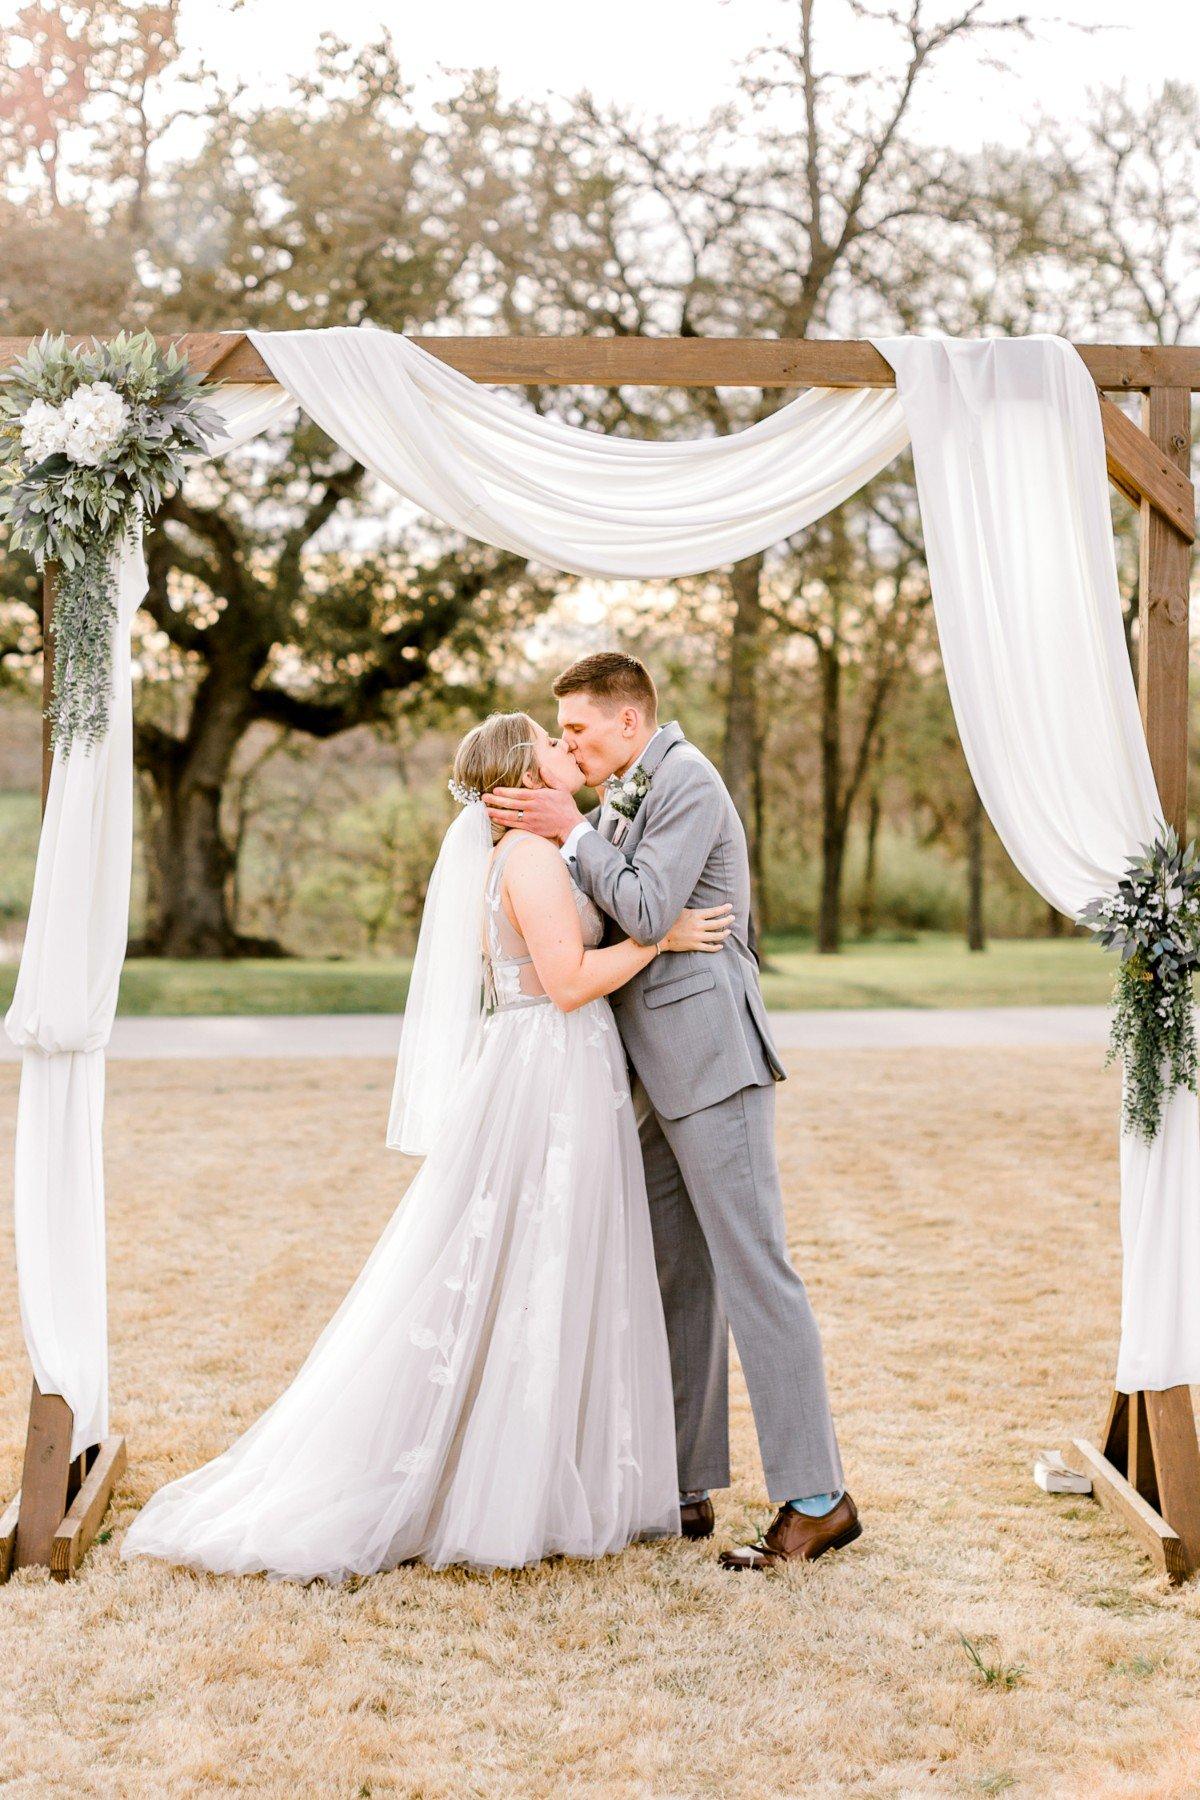 ennis-texas-wedding-photographer-kaitlyn-bullard-76.jpg